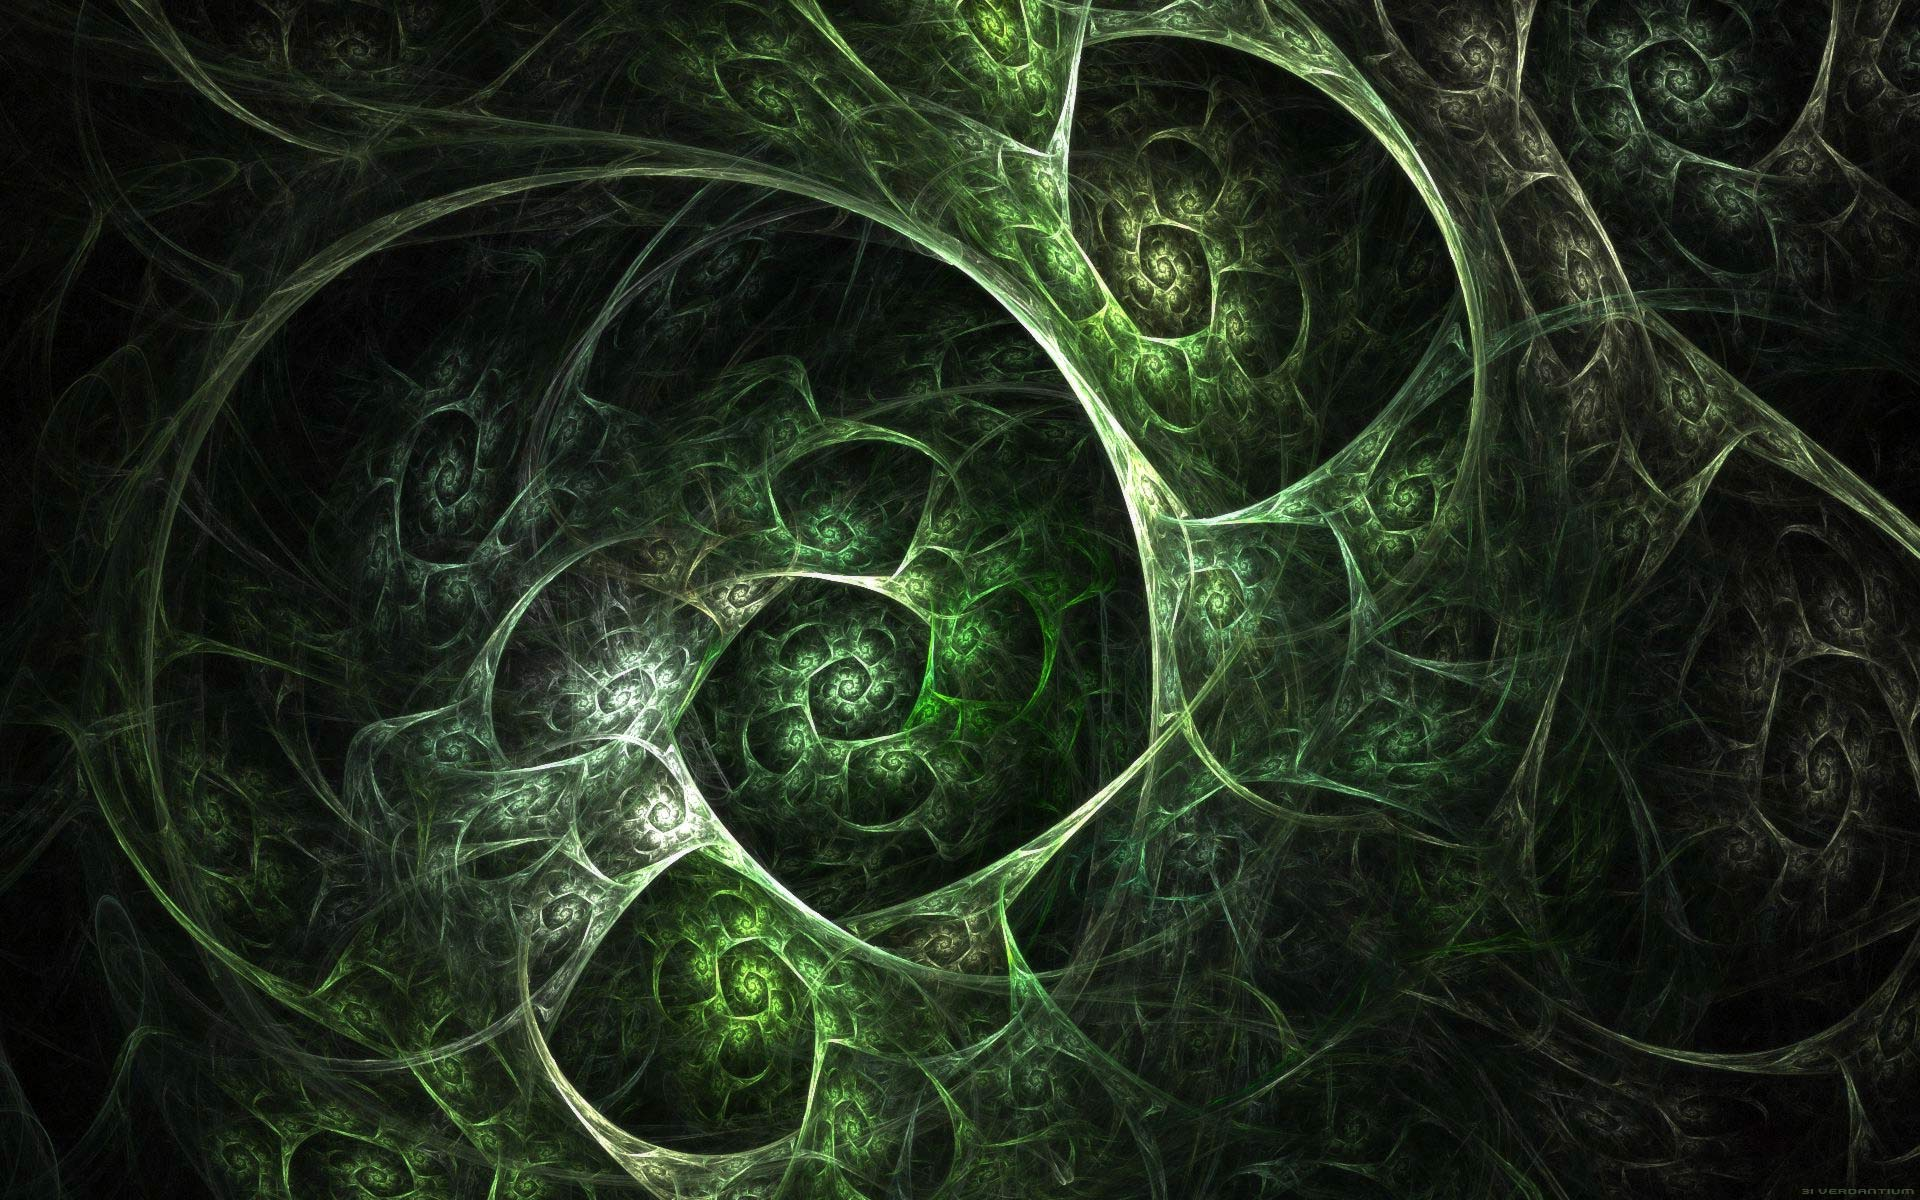 black and green abstract wallpaper 2 hd wallpaper - hdblackwallpaper